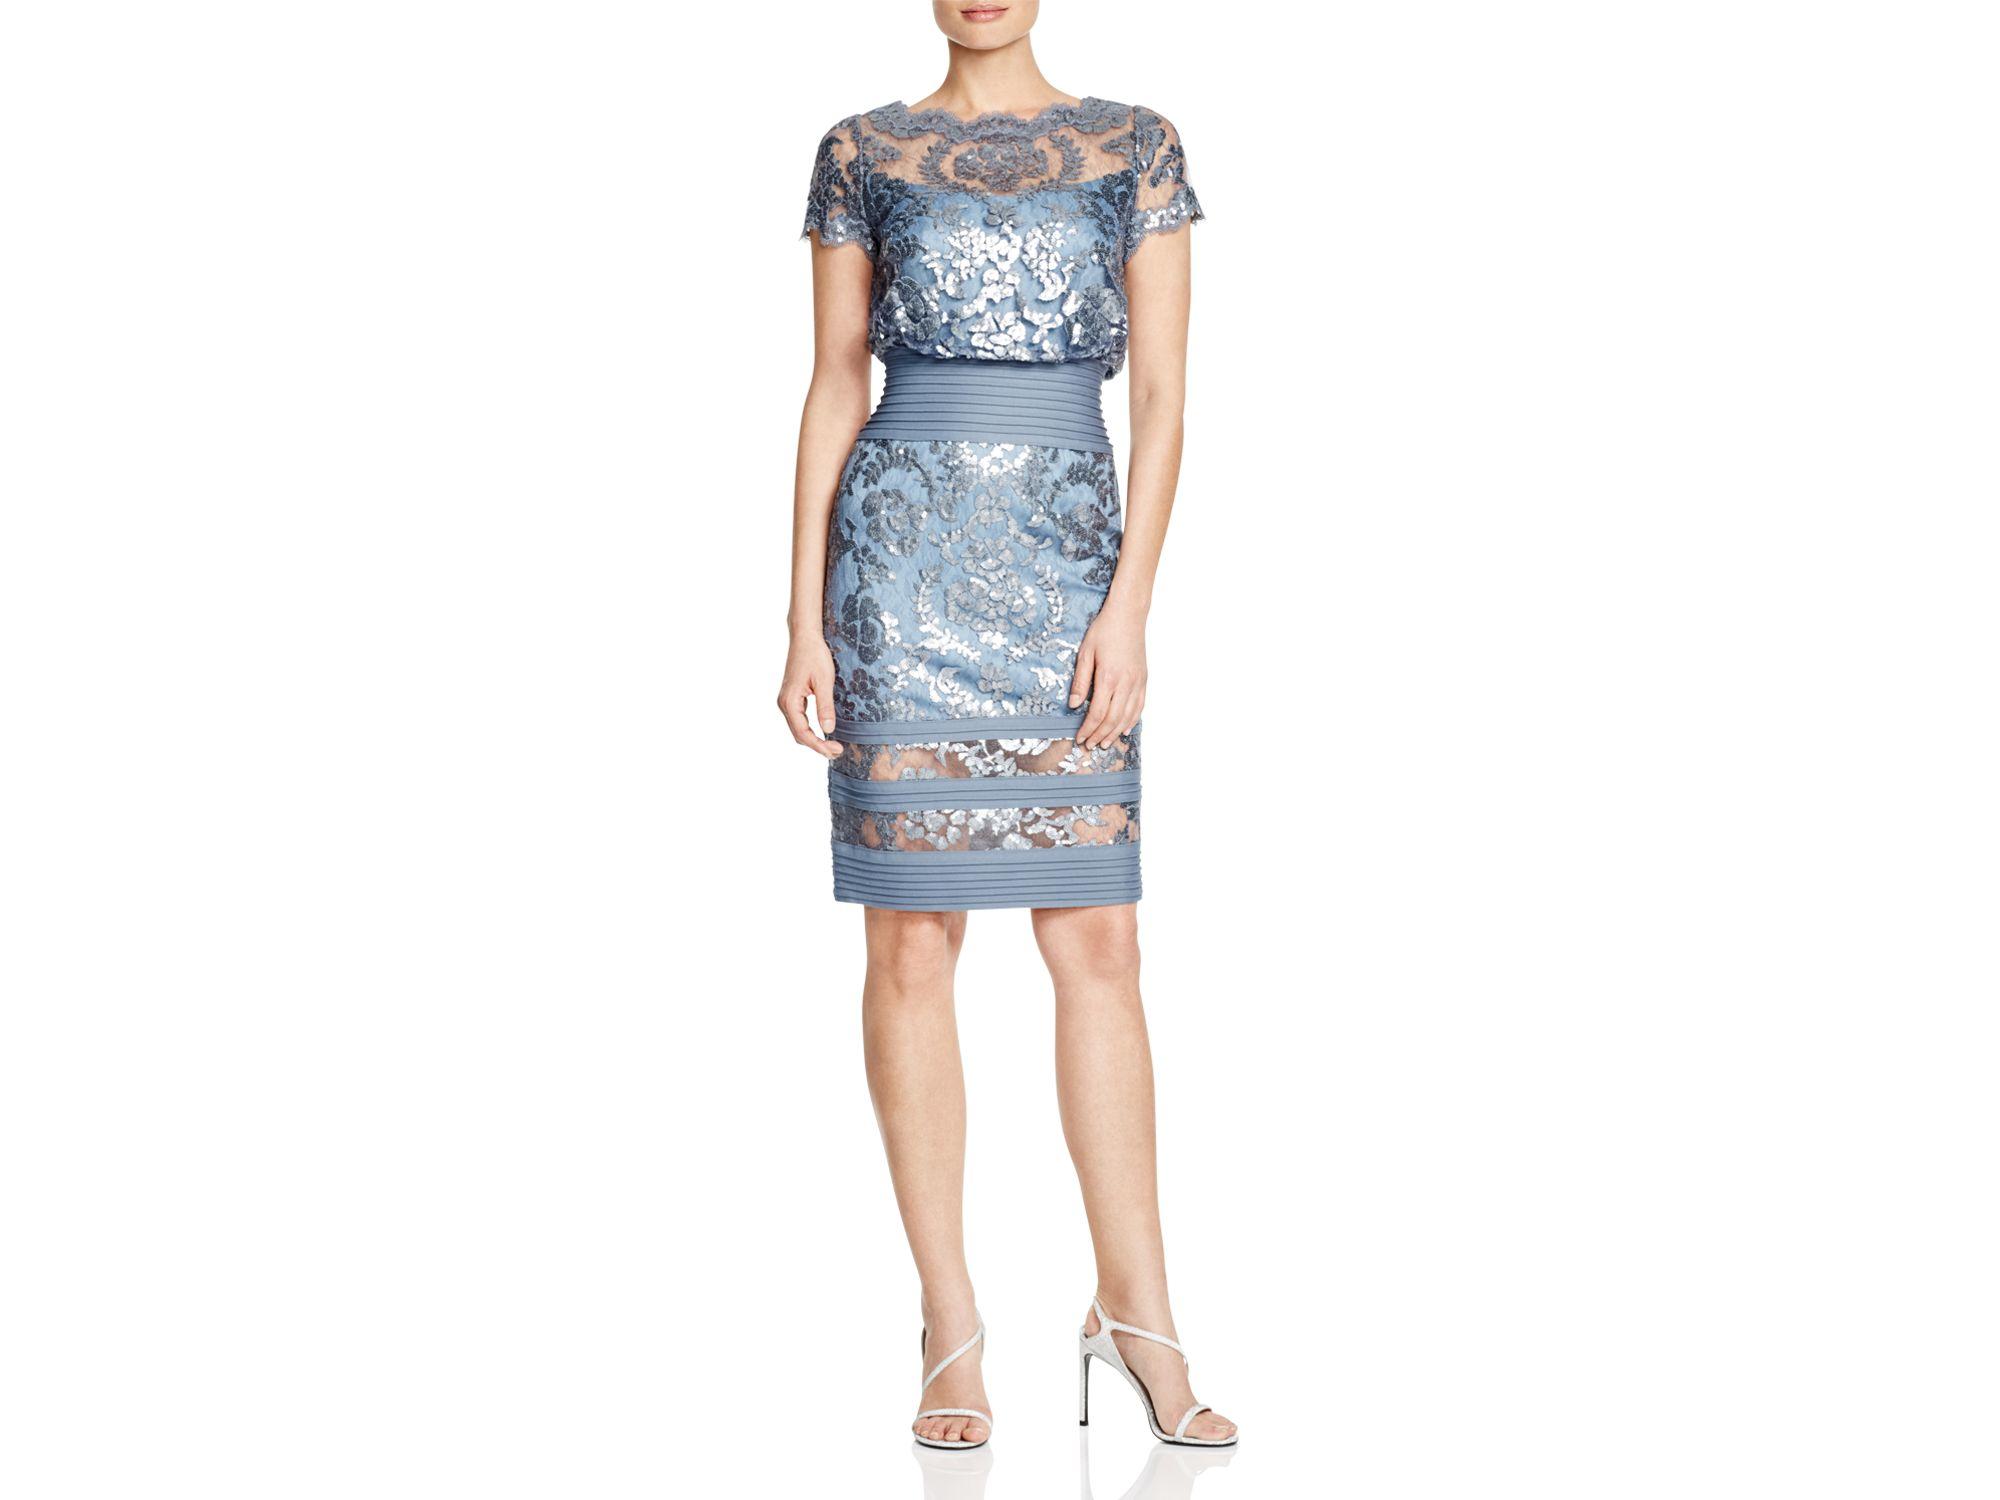 70fe20d403d1 Tadashi Shoji Short Sleeve Sequined Lace Blouson Dress in Blue - Lyst